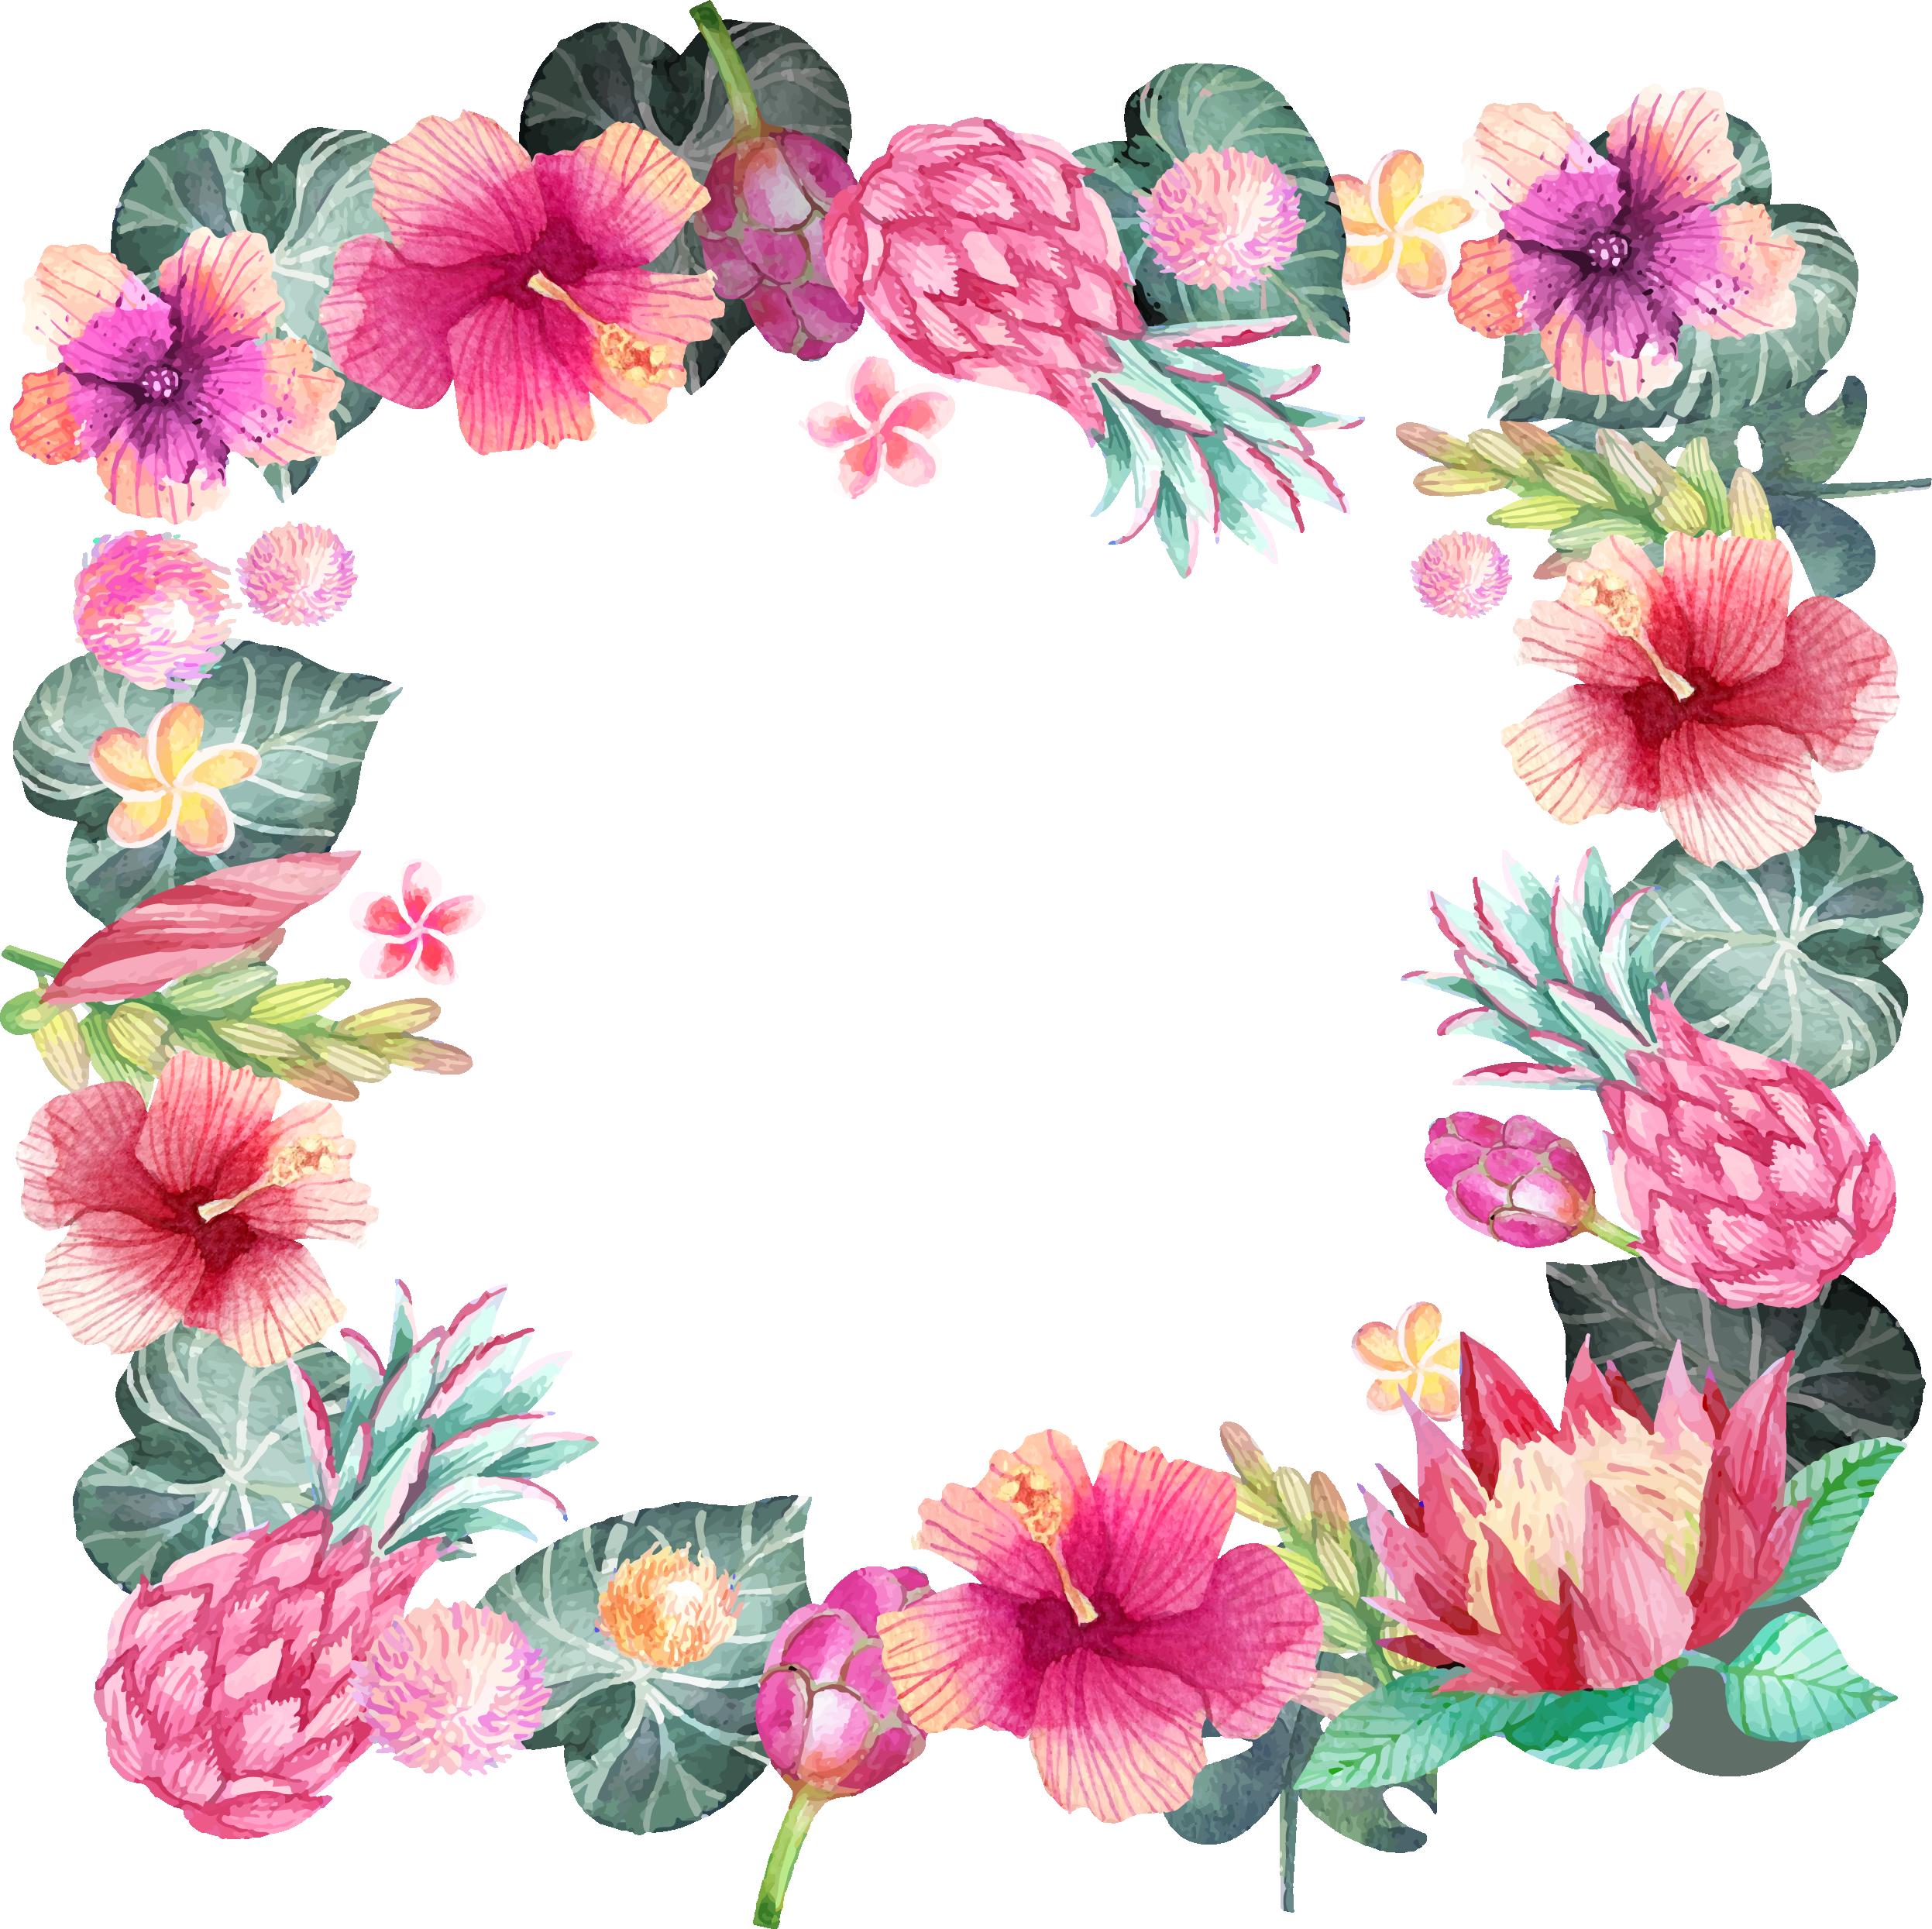 HD Pink Hibiscus Border Png Transparent PNG Image Download.